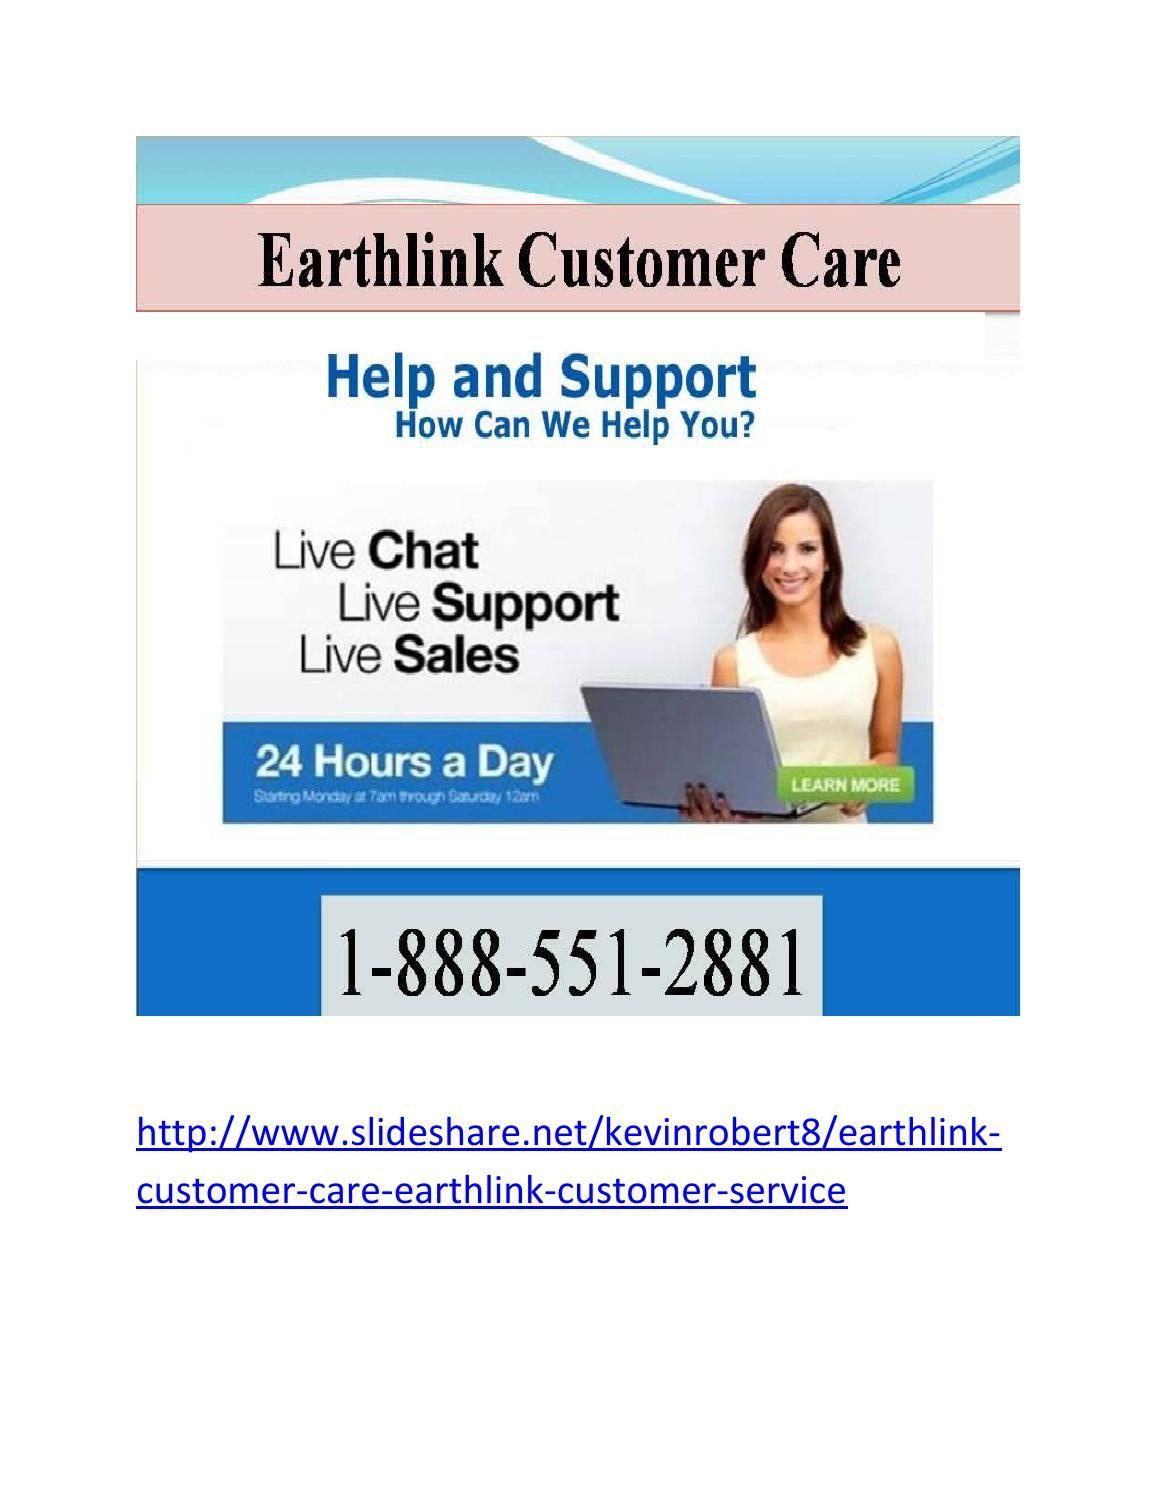 Earthlink customer care 18885512881 Customer care